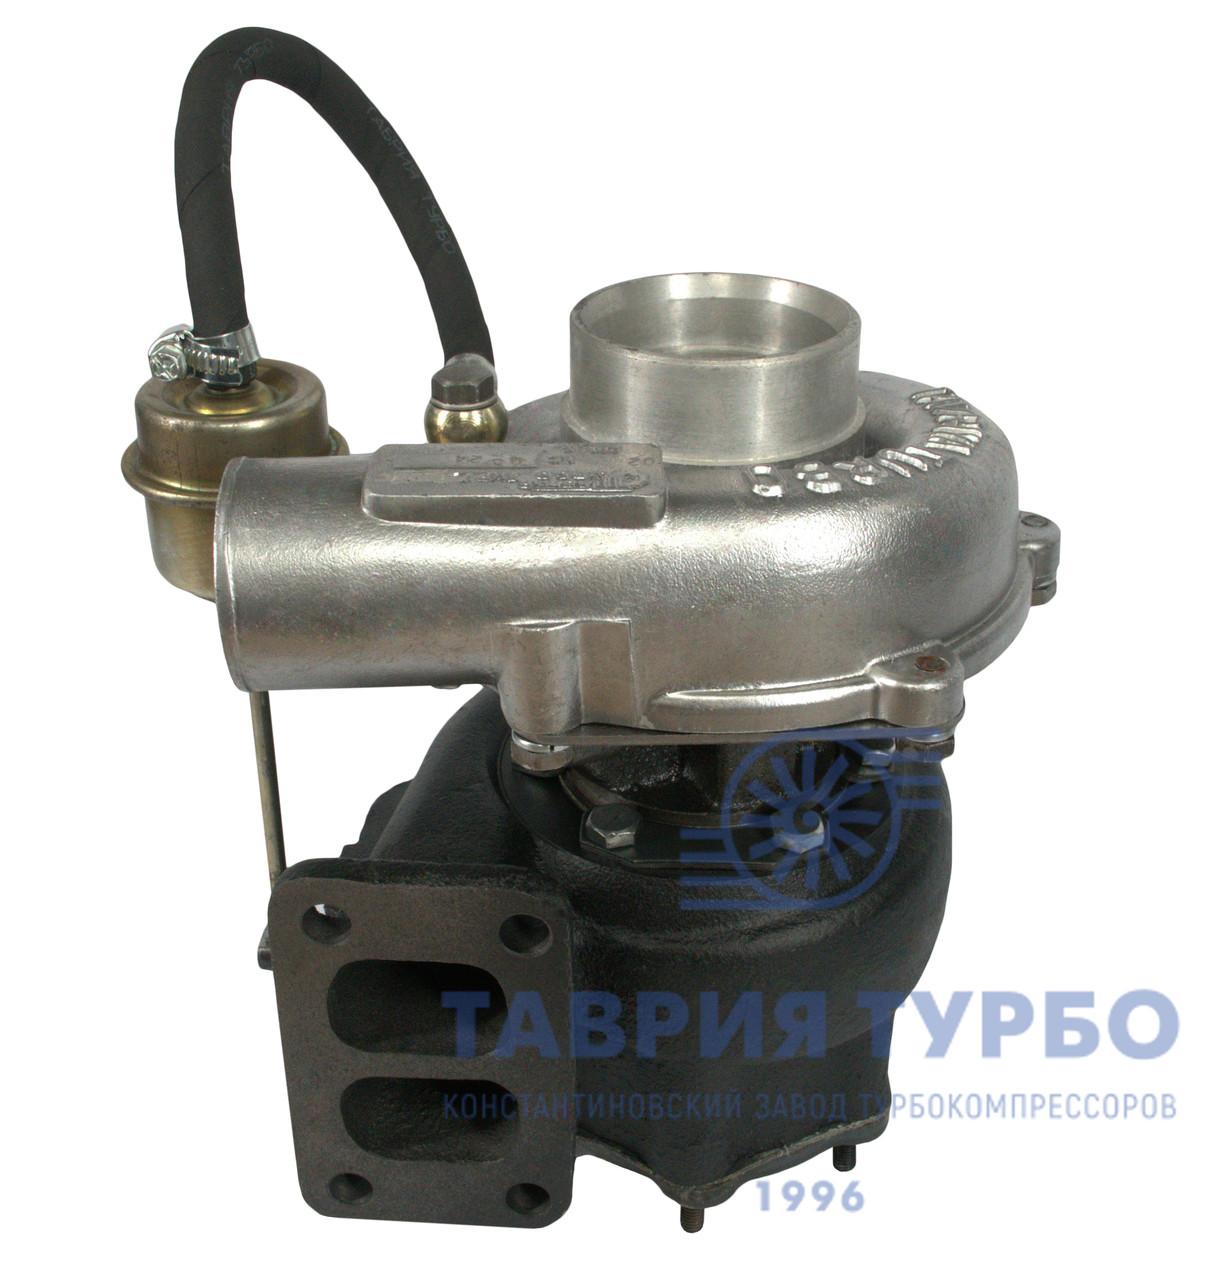 Турбокомпрессор ТКР 7.1-02 , Турбина на Автомобиль МАЗ; Двигатель Д-260.5Е2